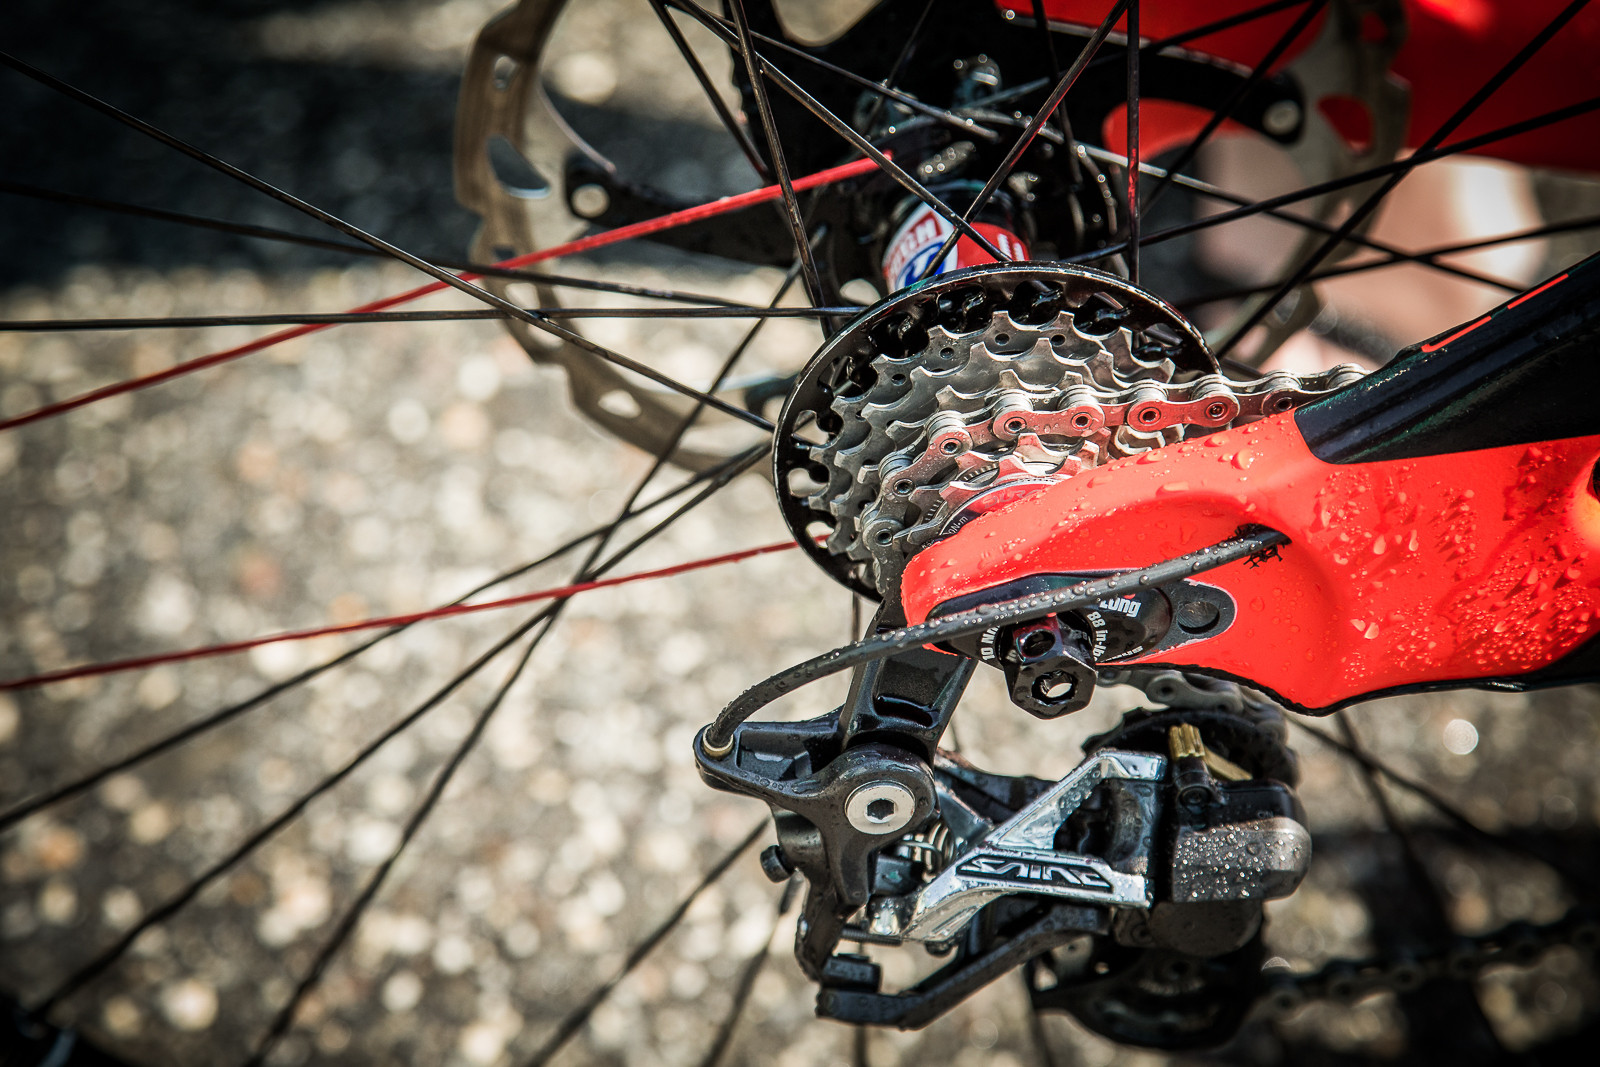 Fairclough's Custom 7-speed Shimano Cassette - PIT BITS - World Cup Lenzerheide, Switzerland - Mountain Biking Pictures - Vital MTB